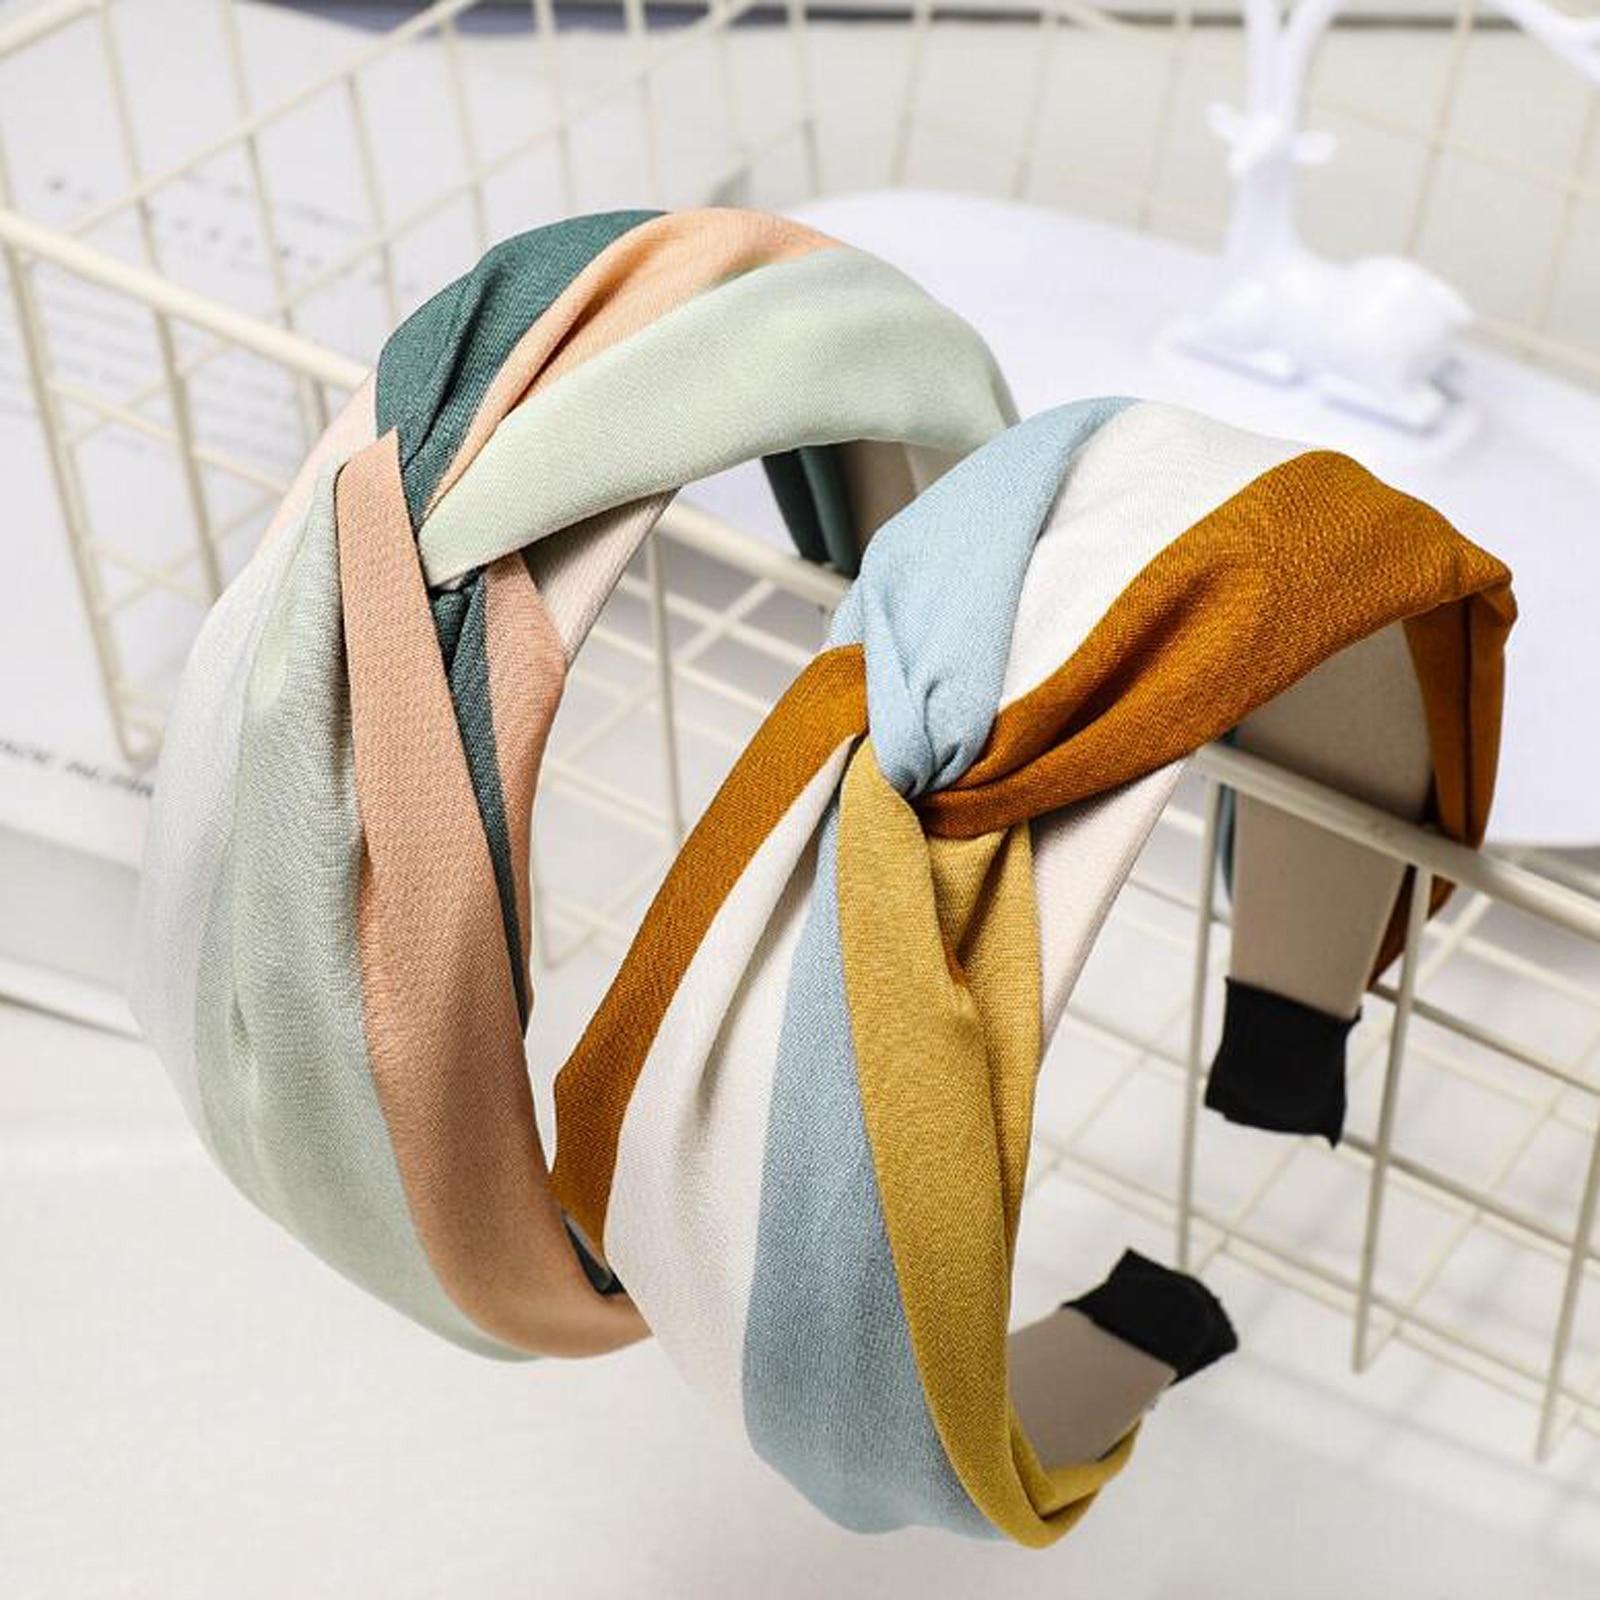 New Fashion Women Hairband Wide Side Headband Cross Knot Turban Classic Striped Headwear Girls Hair Accessories Drop Shipping(China)